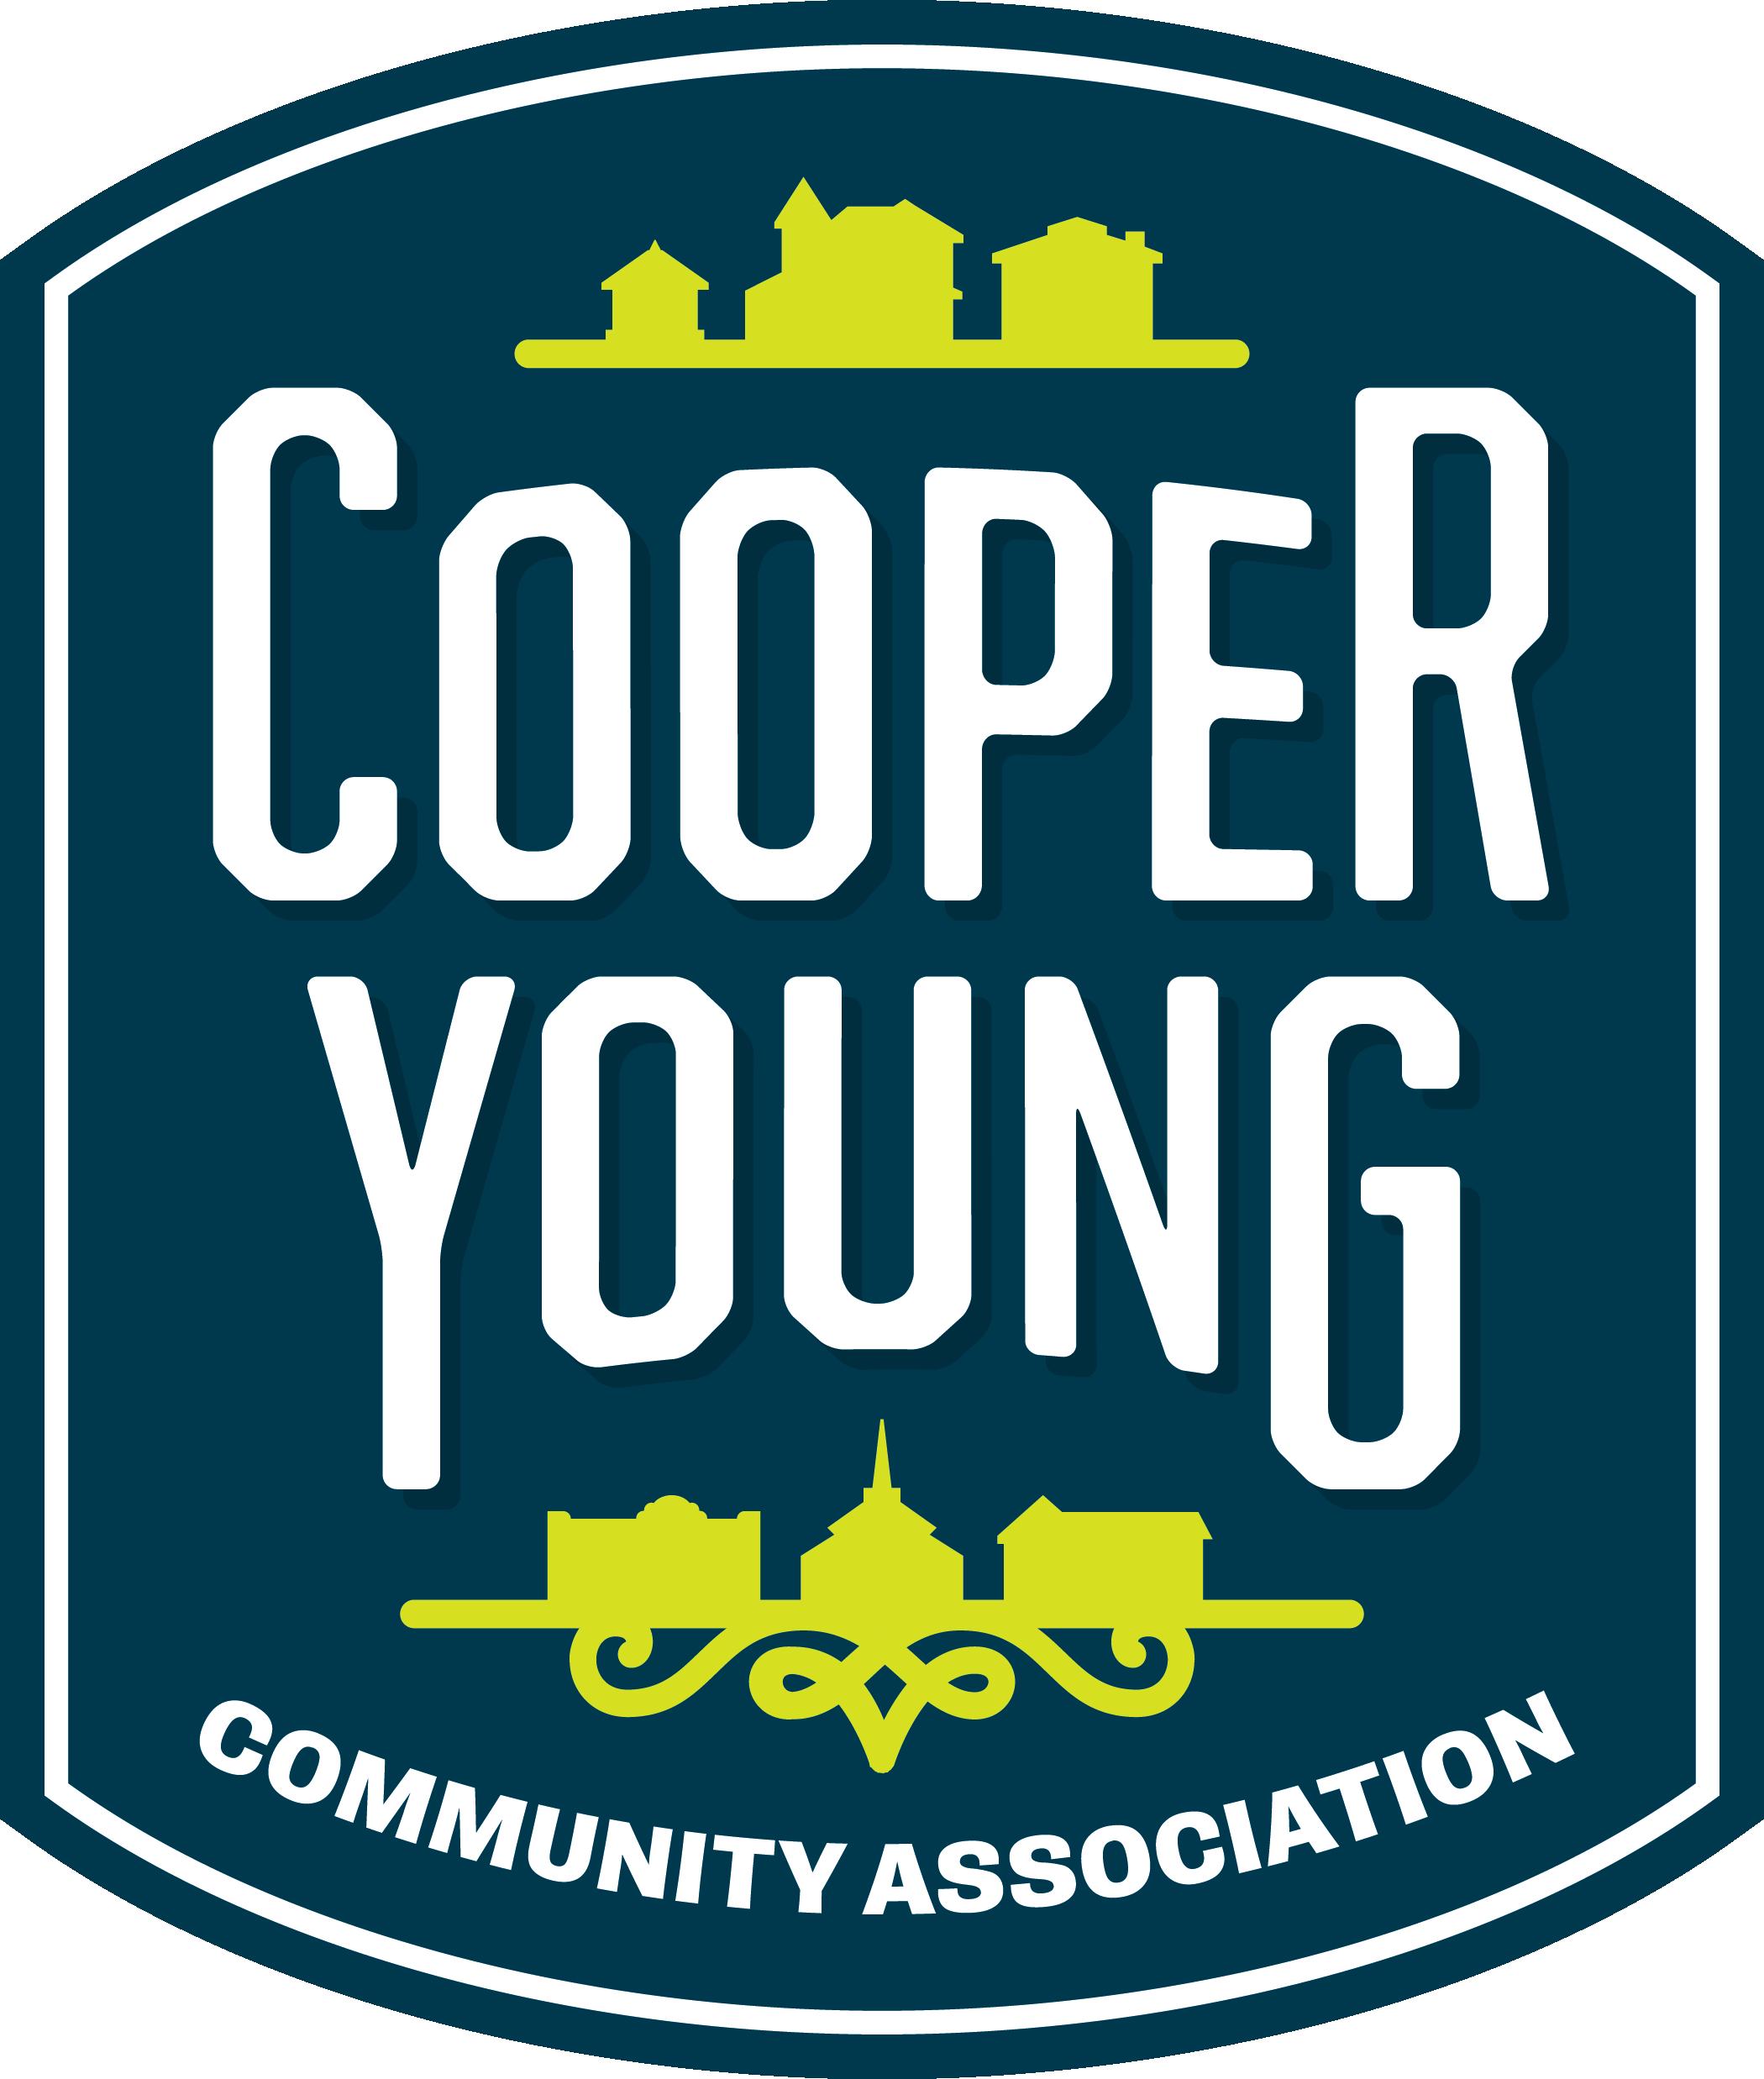 Cyca Cooper Young Community Association The Neighbourhood